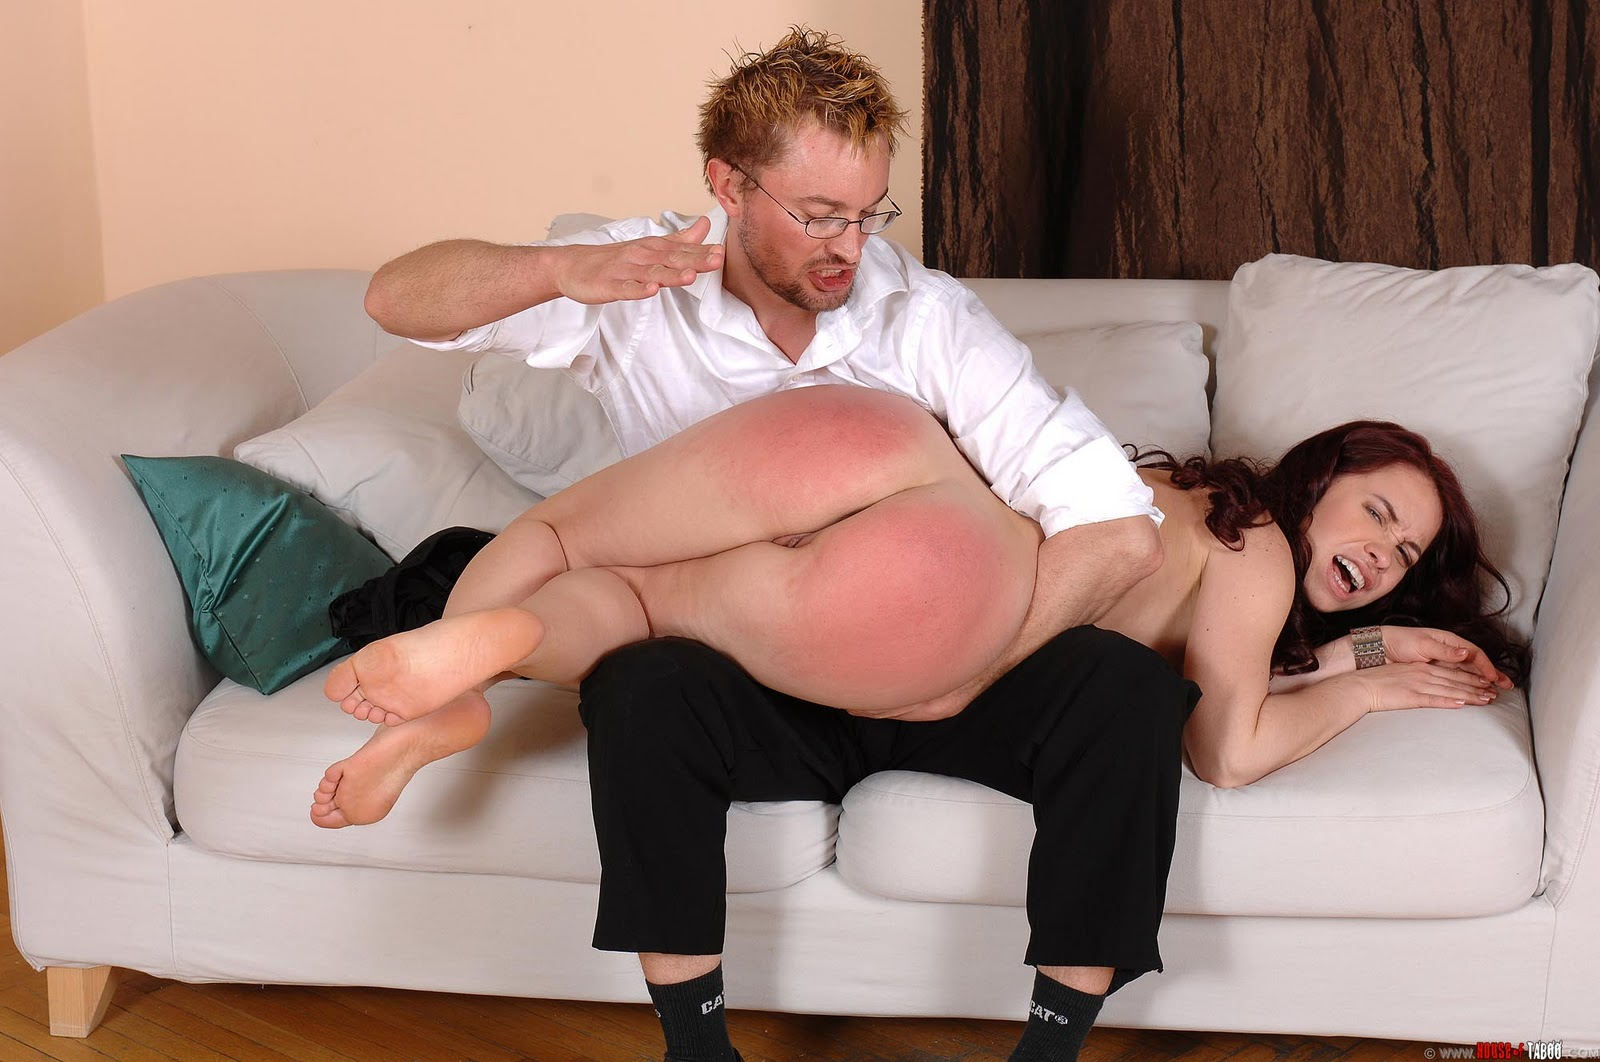 Female Ass Spanking Photo Album - Amateur Adult Gallery